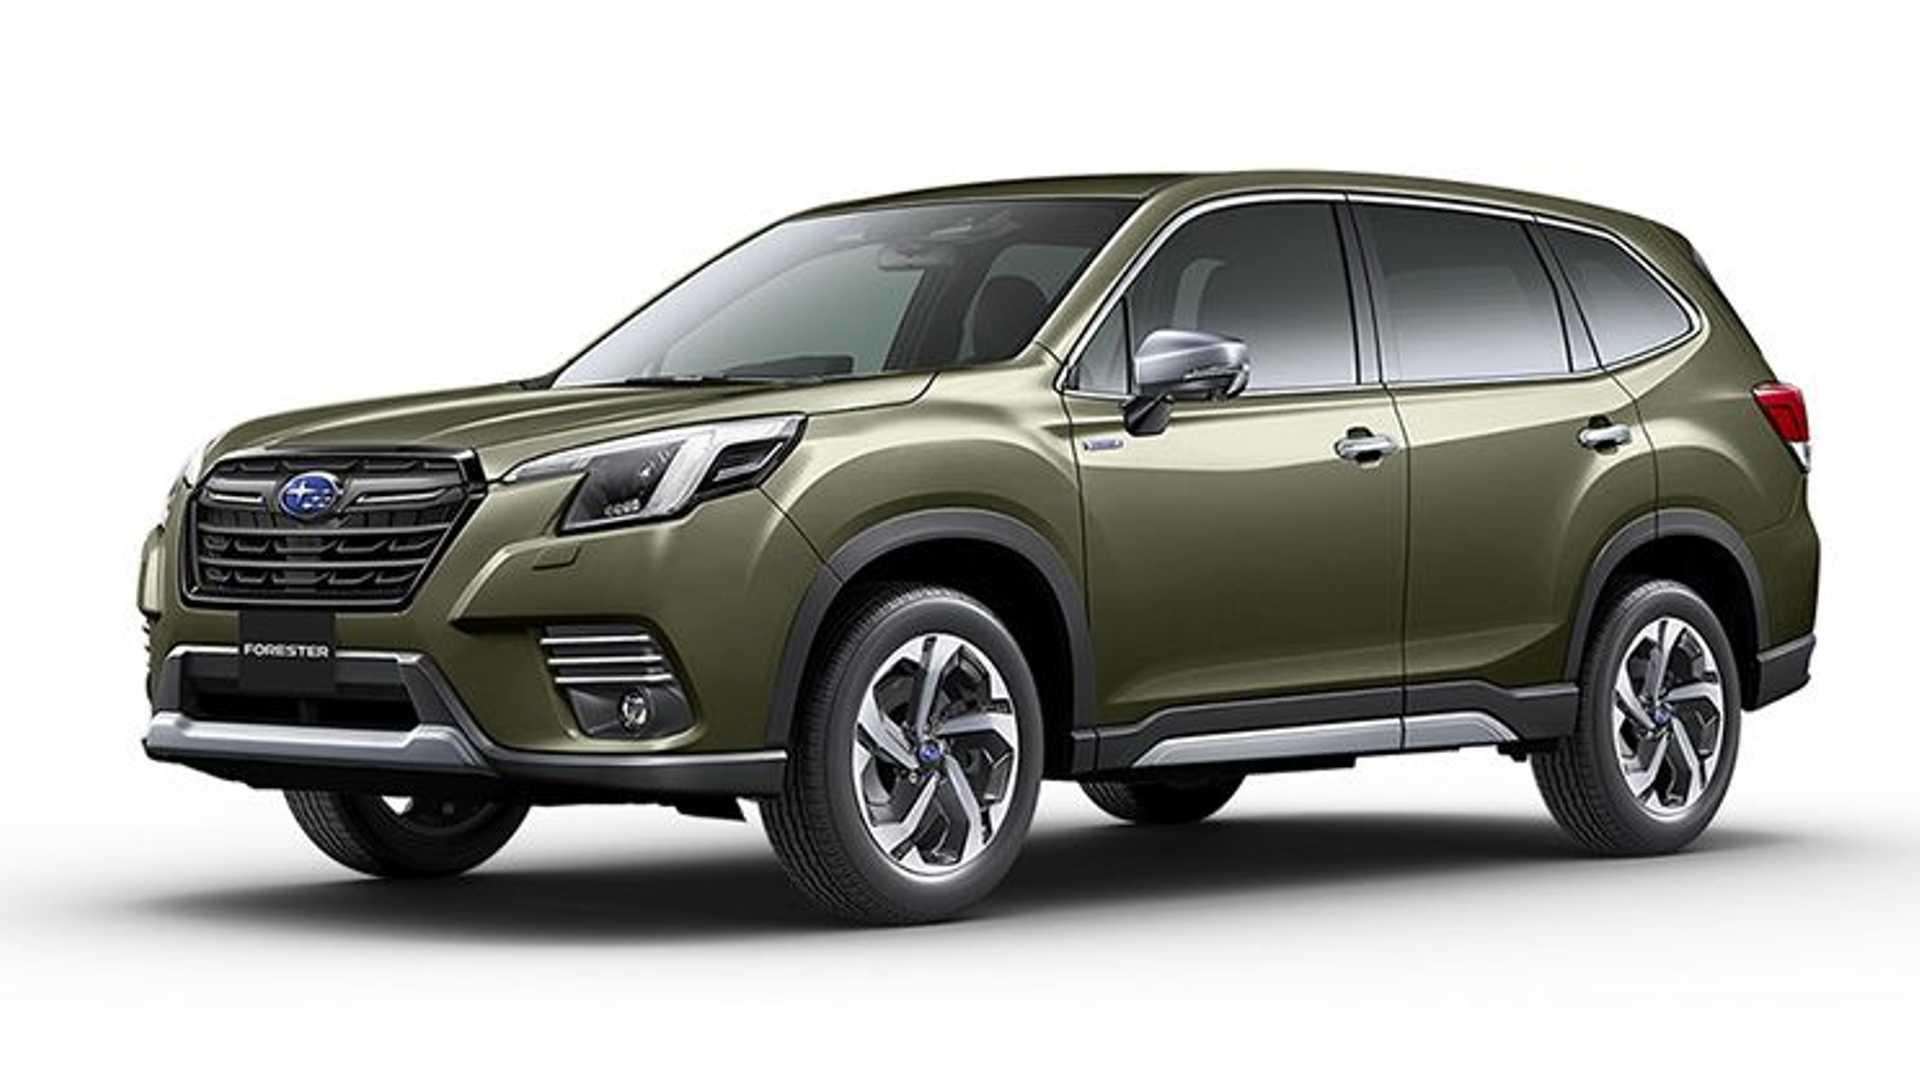 Subaru-Forester-facelift-6